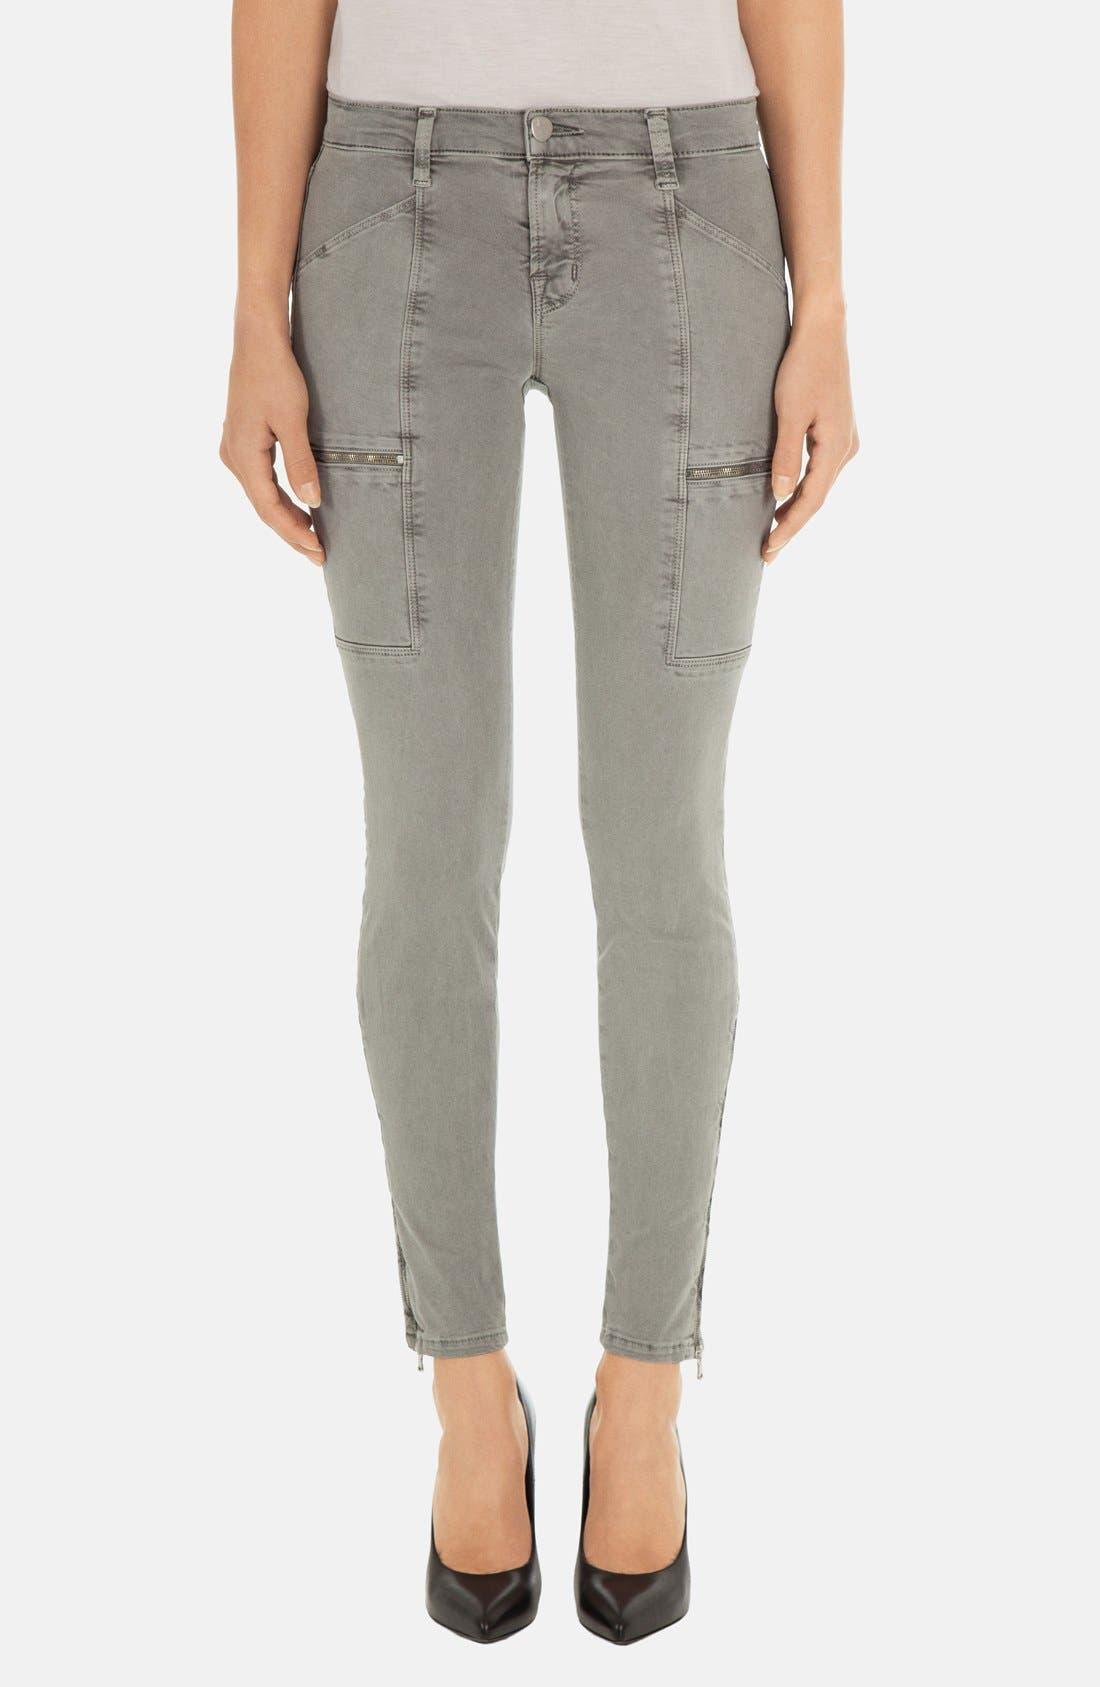 Main Image - J Brand 'Kassidy' Skinny Jeans (Vintage Olive)